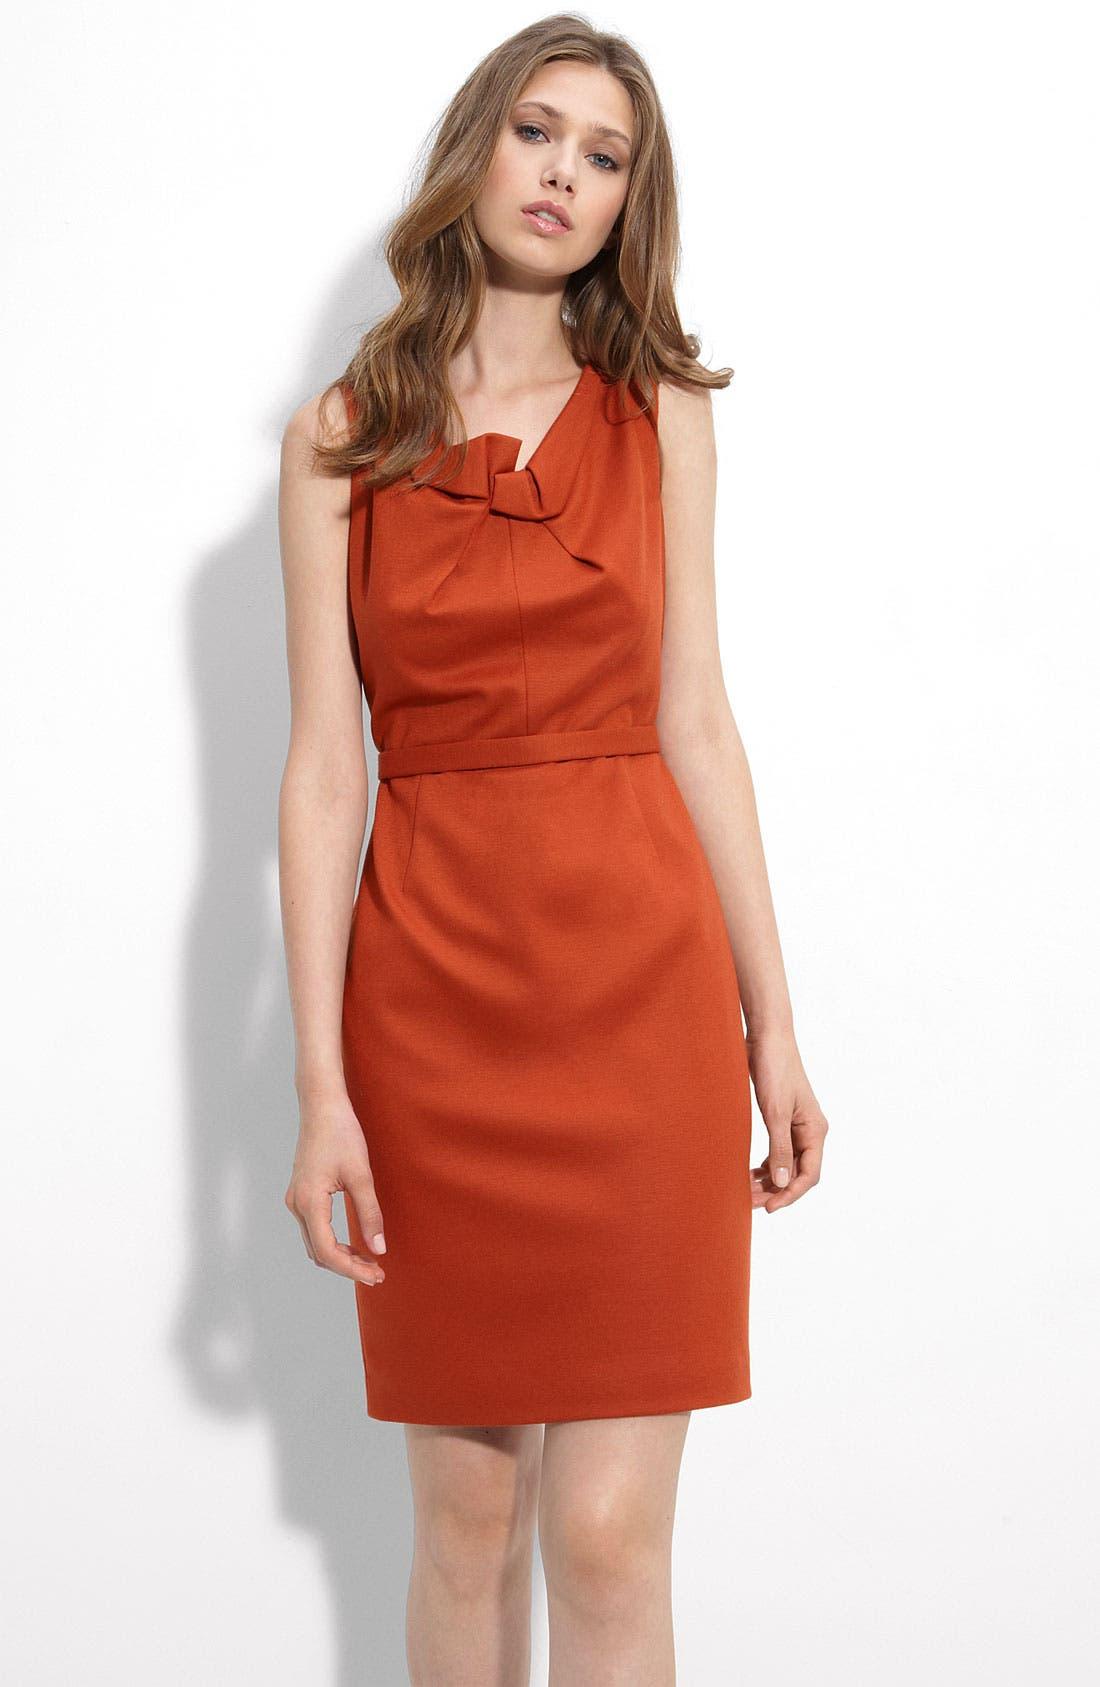 Main Image - Elie Tahari Exclusive for Nordstrom 'Lori' Dress